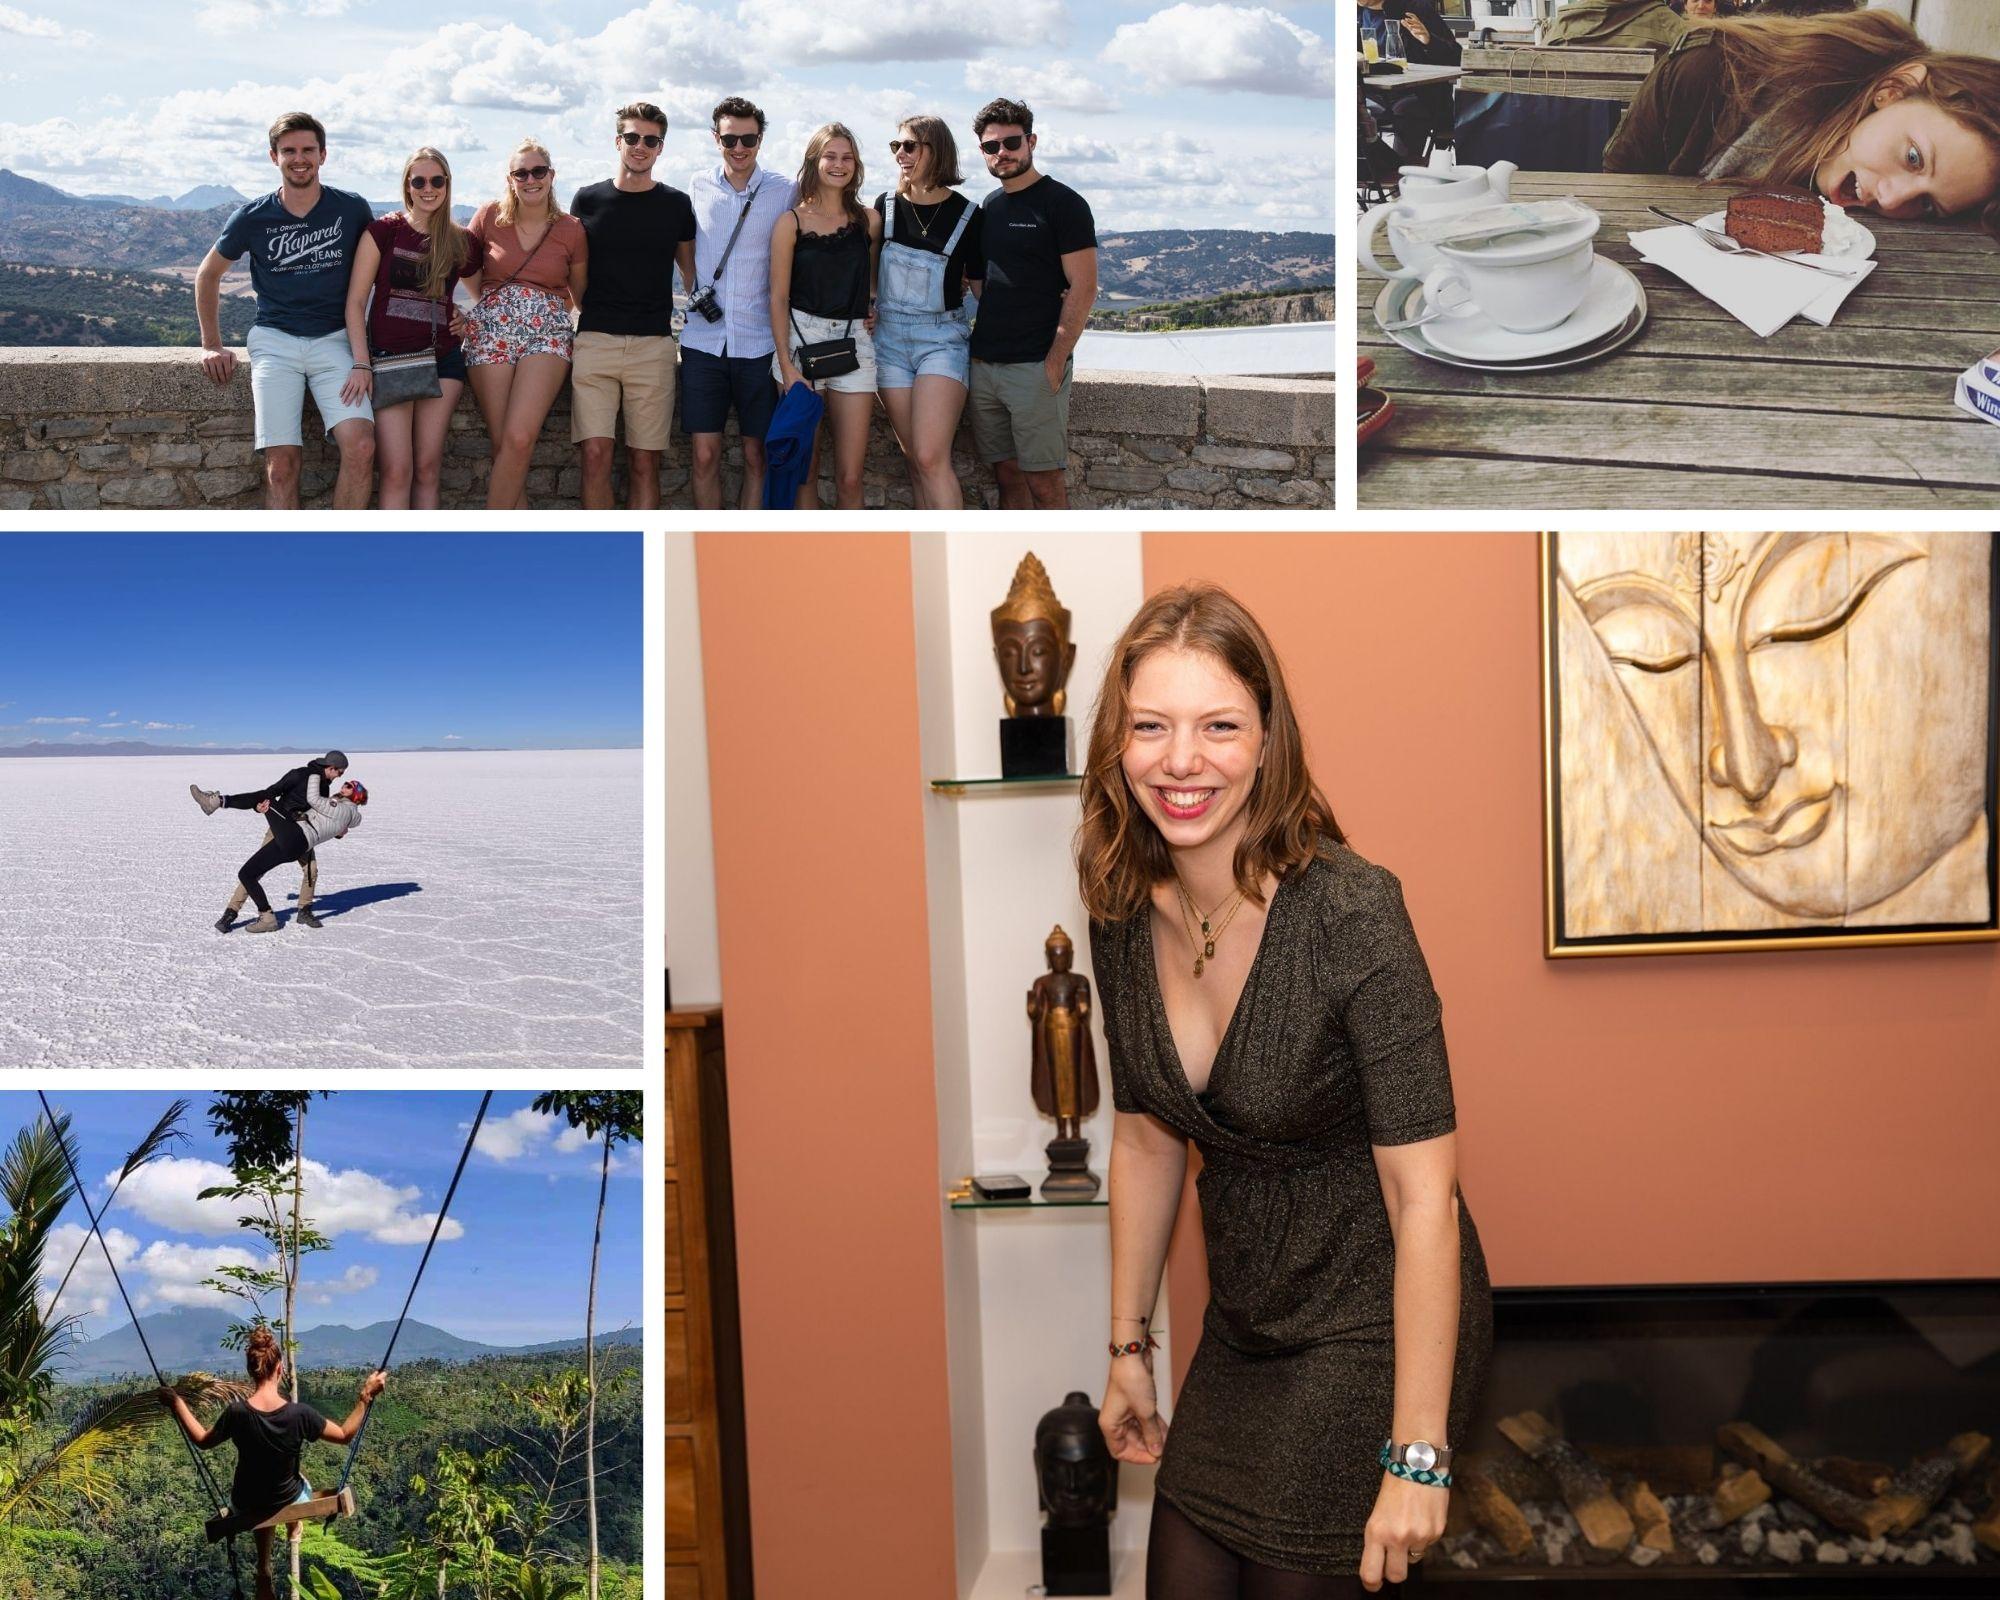 S4M Stars – Sarah Moortgat, Sales Manager Benelux